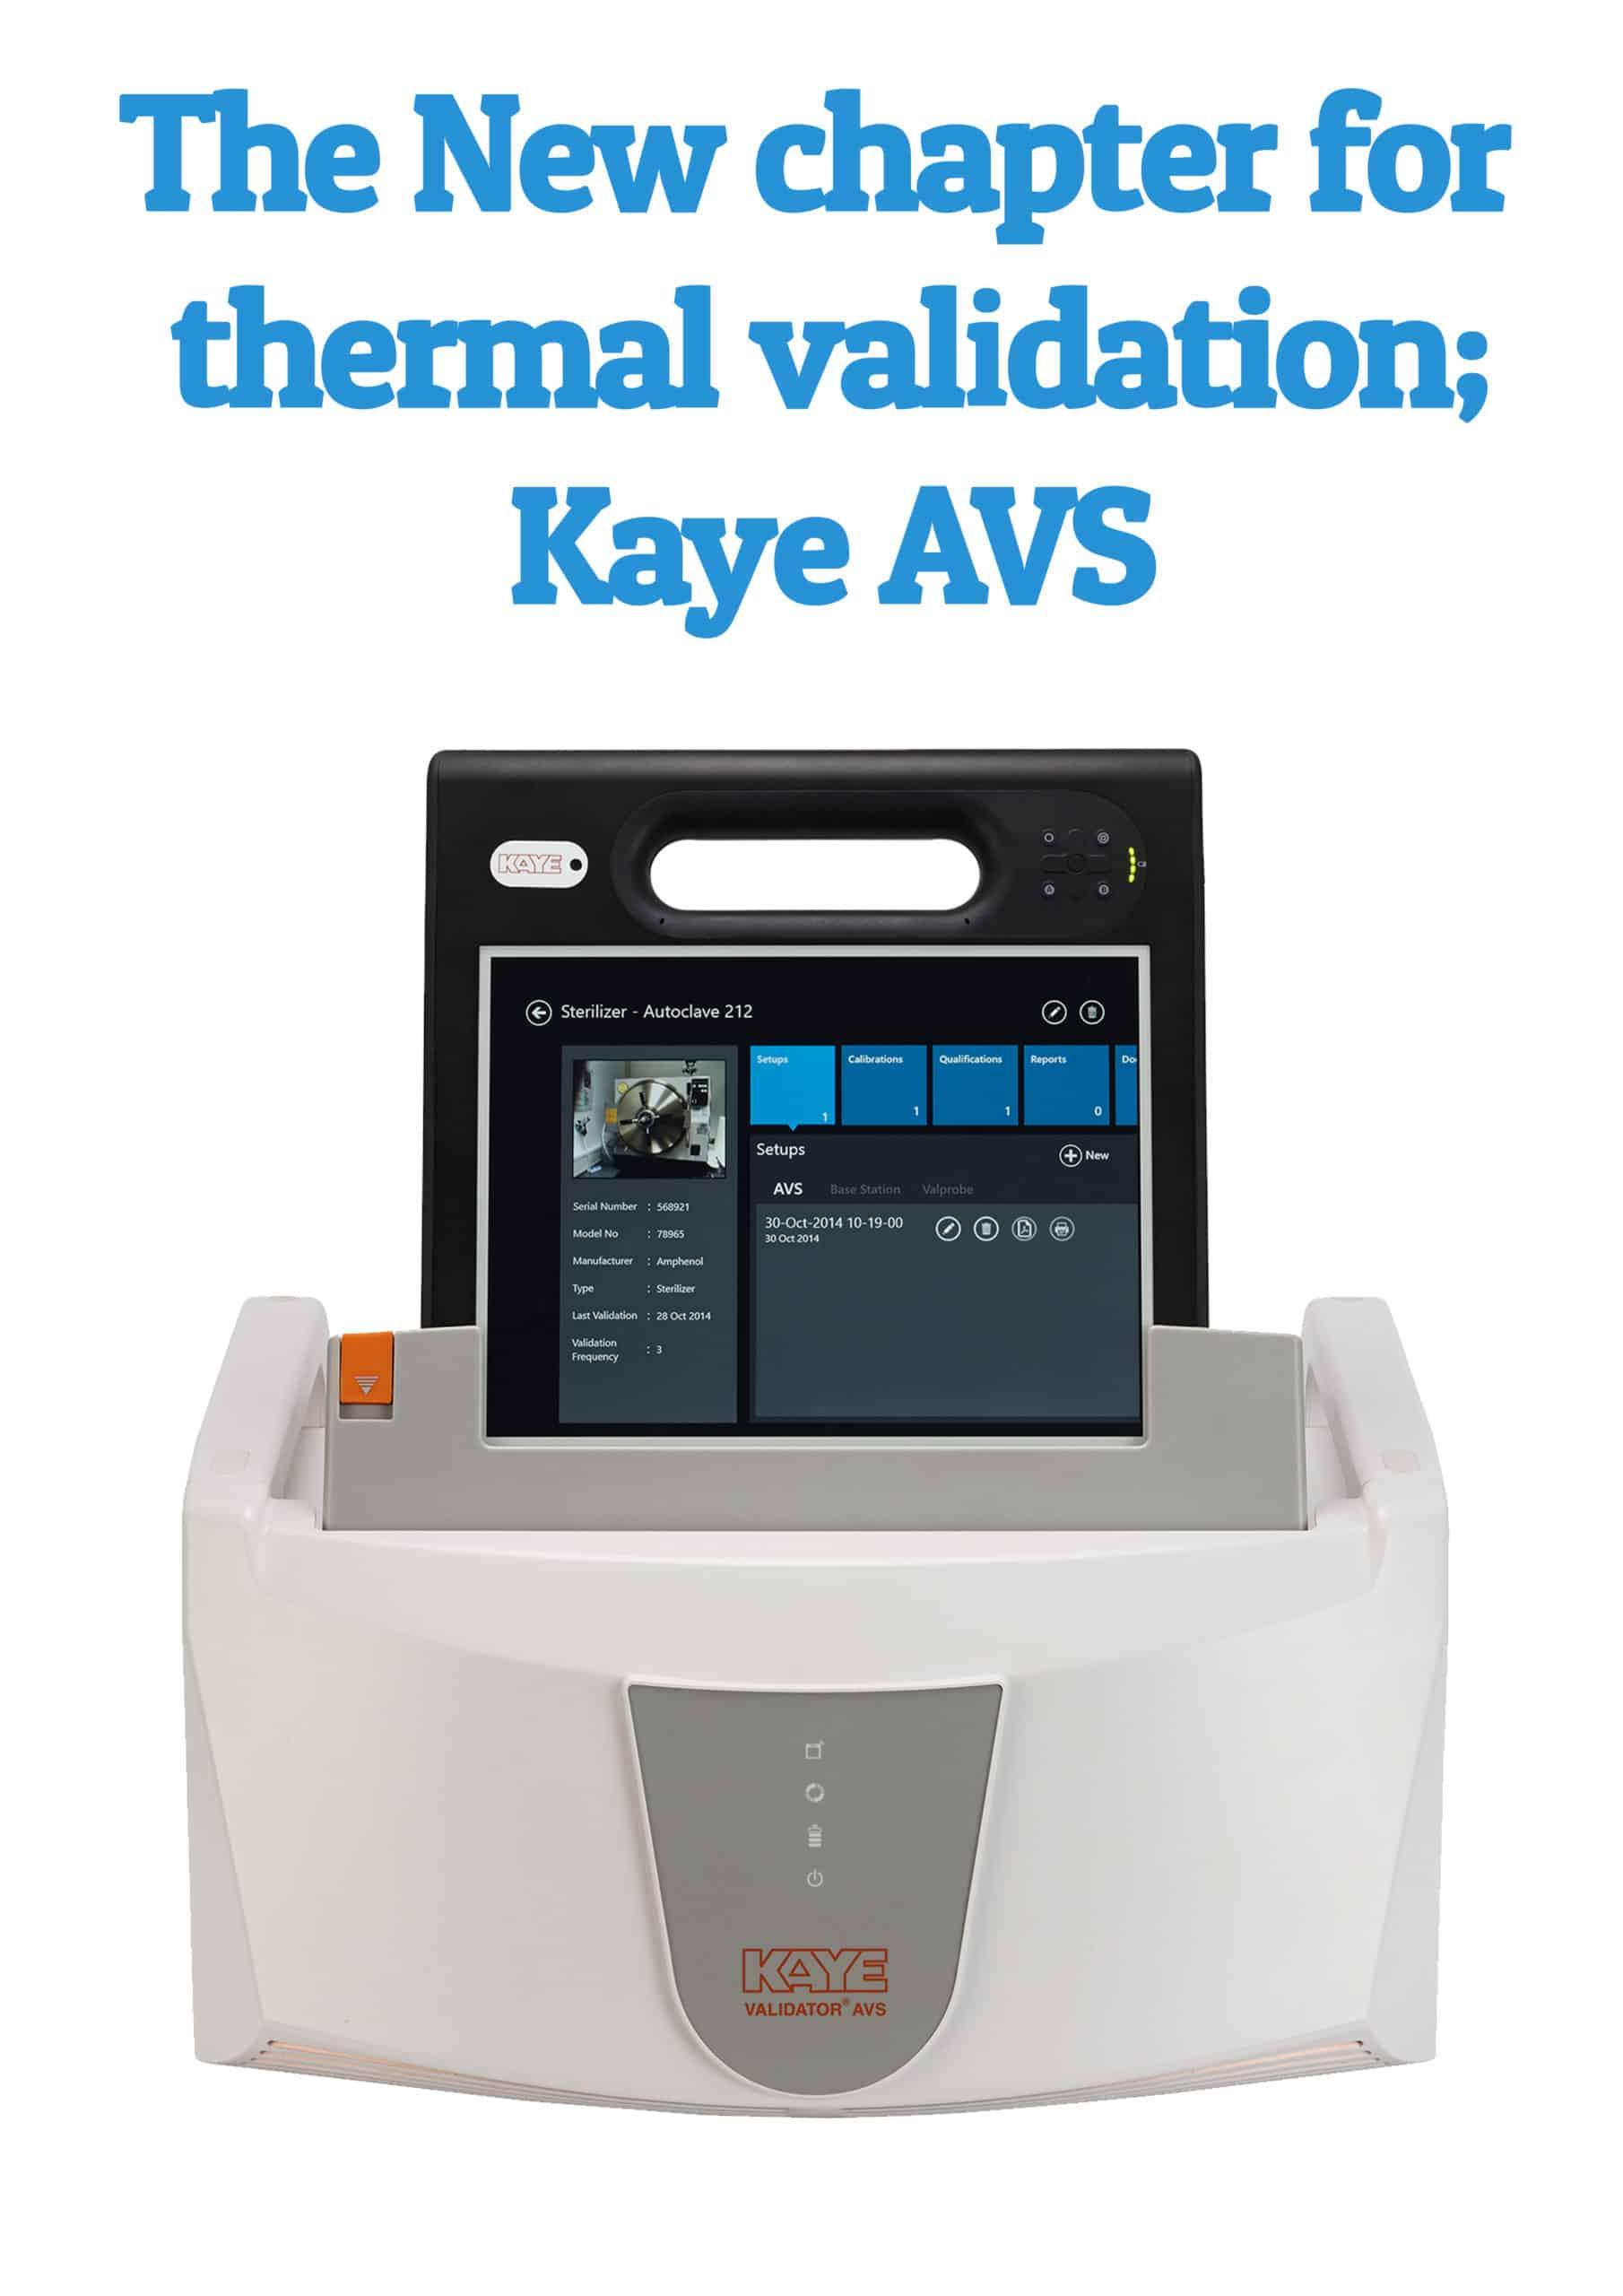 Kaye Validator 2000 (Kaye V2K)